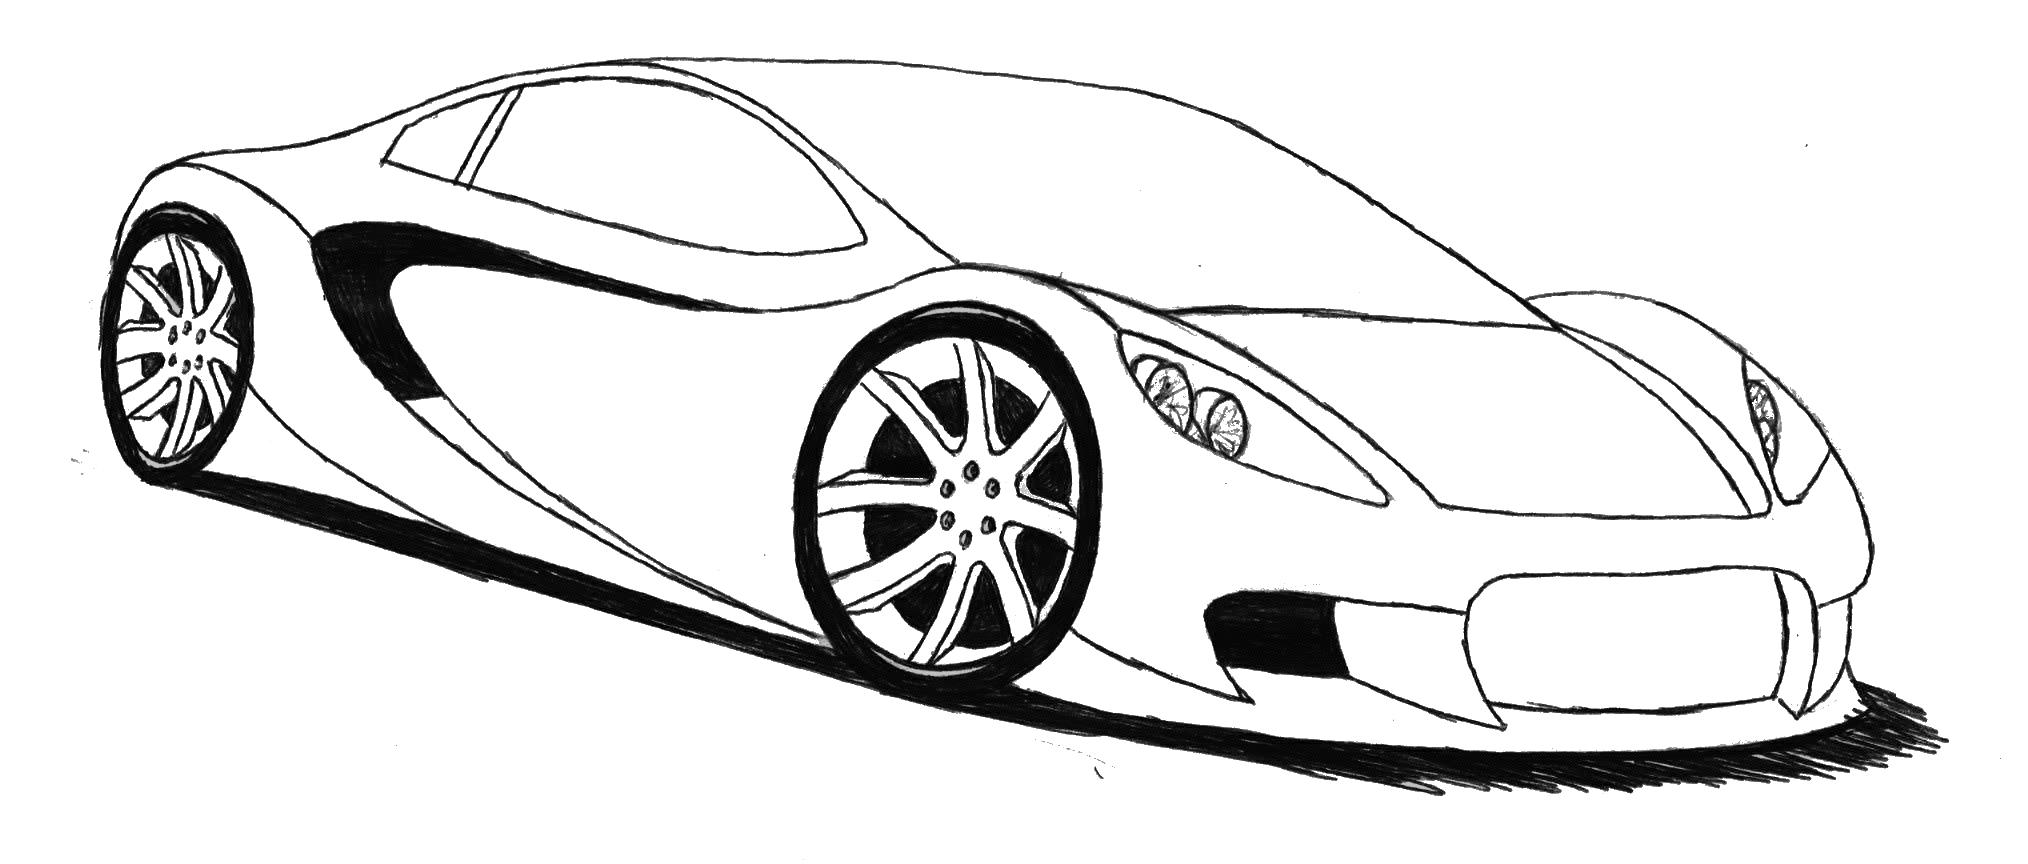 Automotive Design By John Heineck At Coroflot